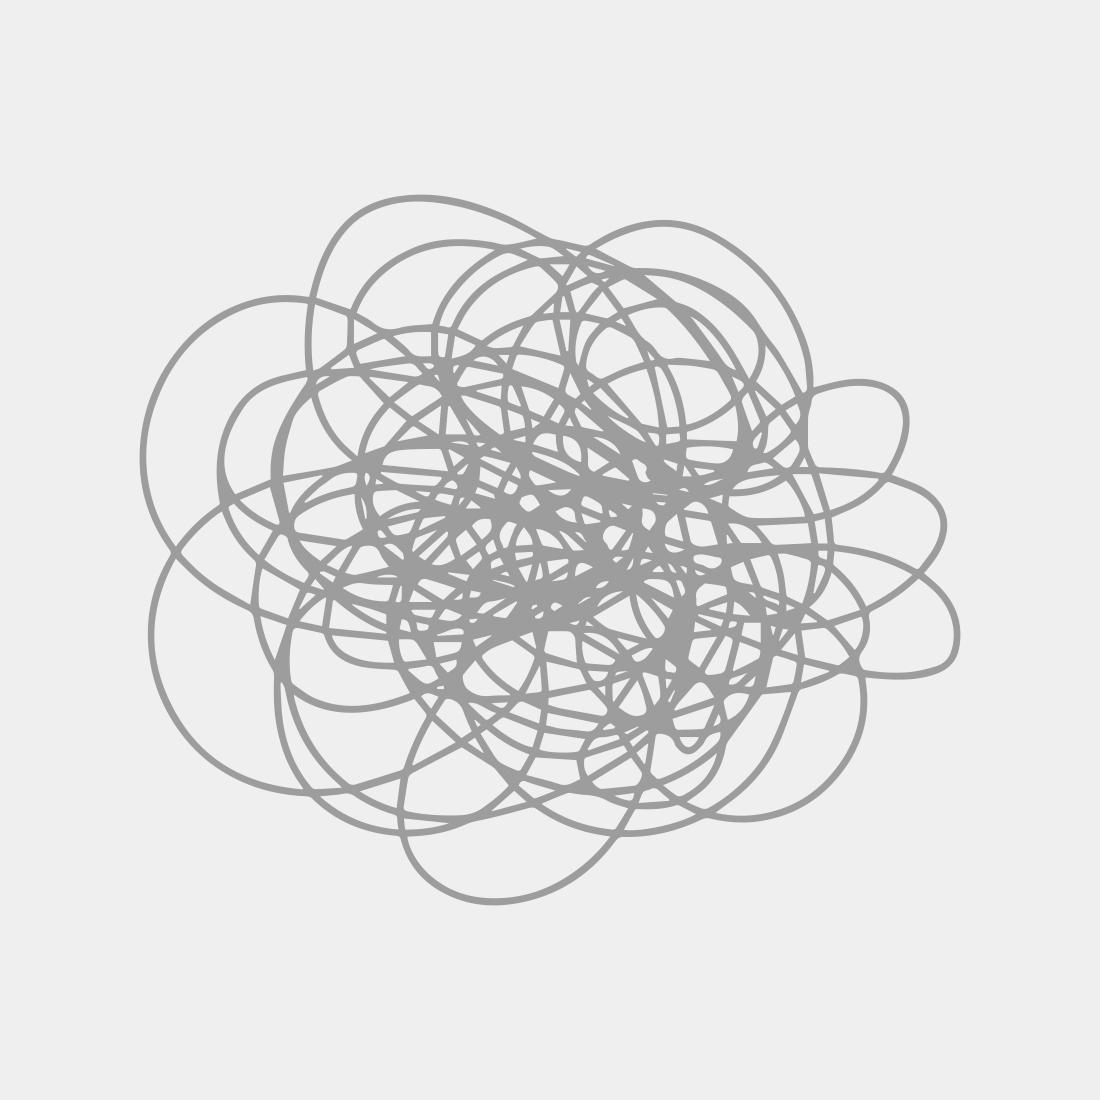 Albert Irvin OBE RA Untitled opus w.50